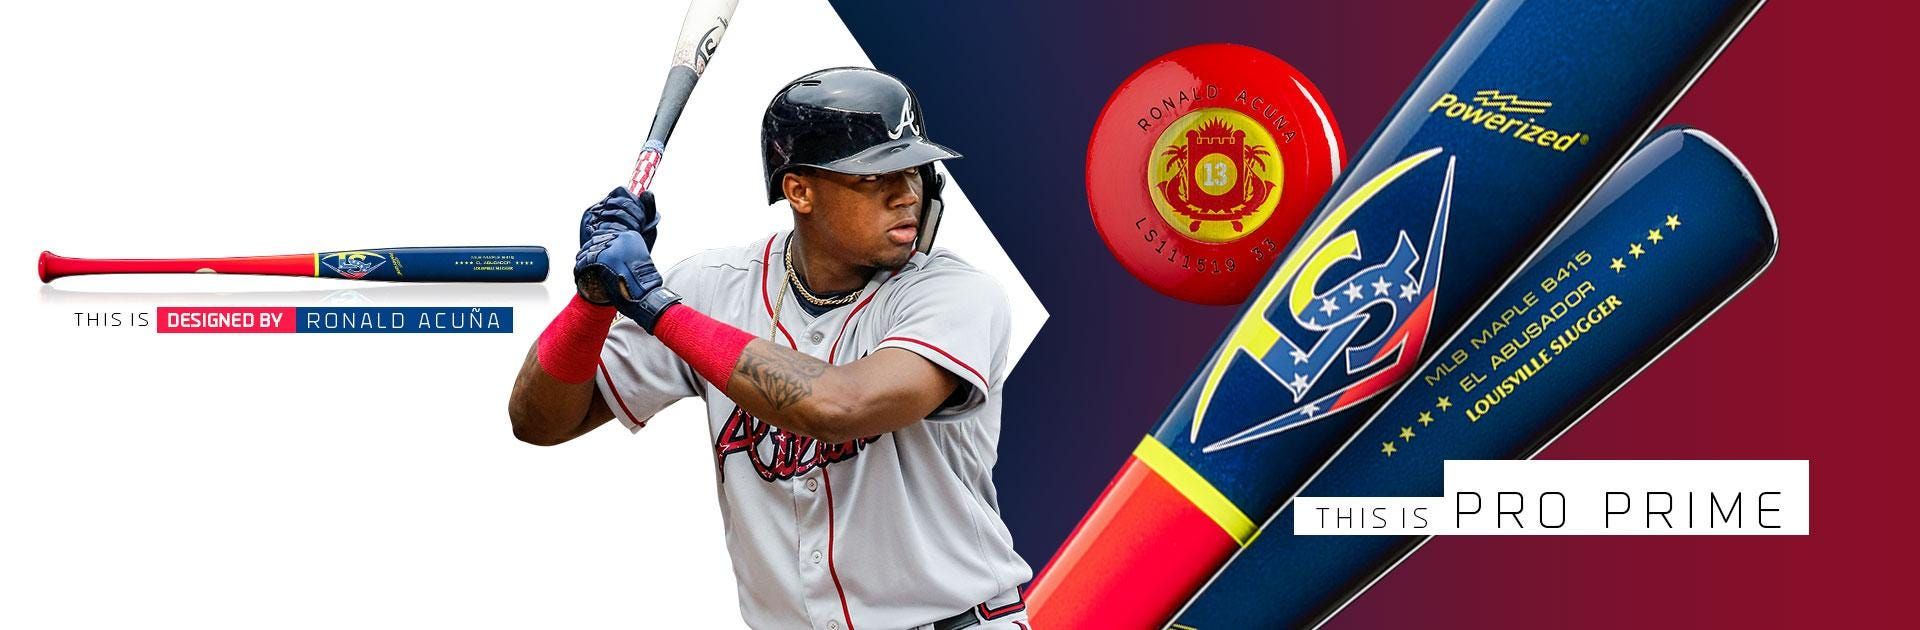 Ronald Acuna Pro Prime Baseball Bat